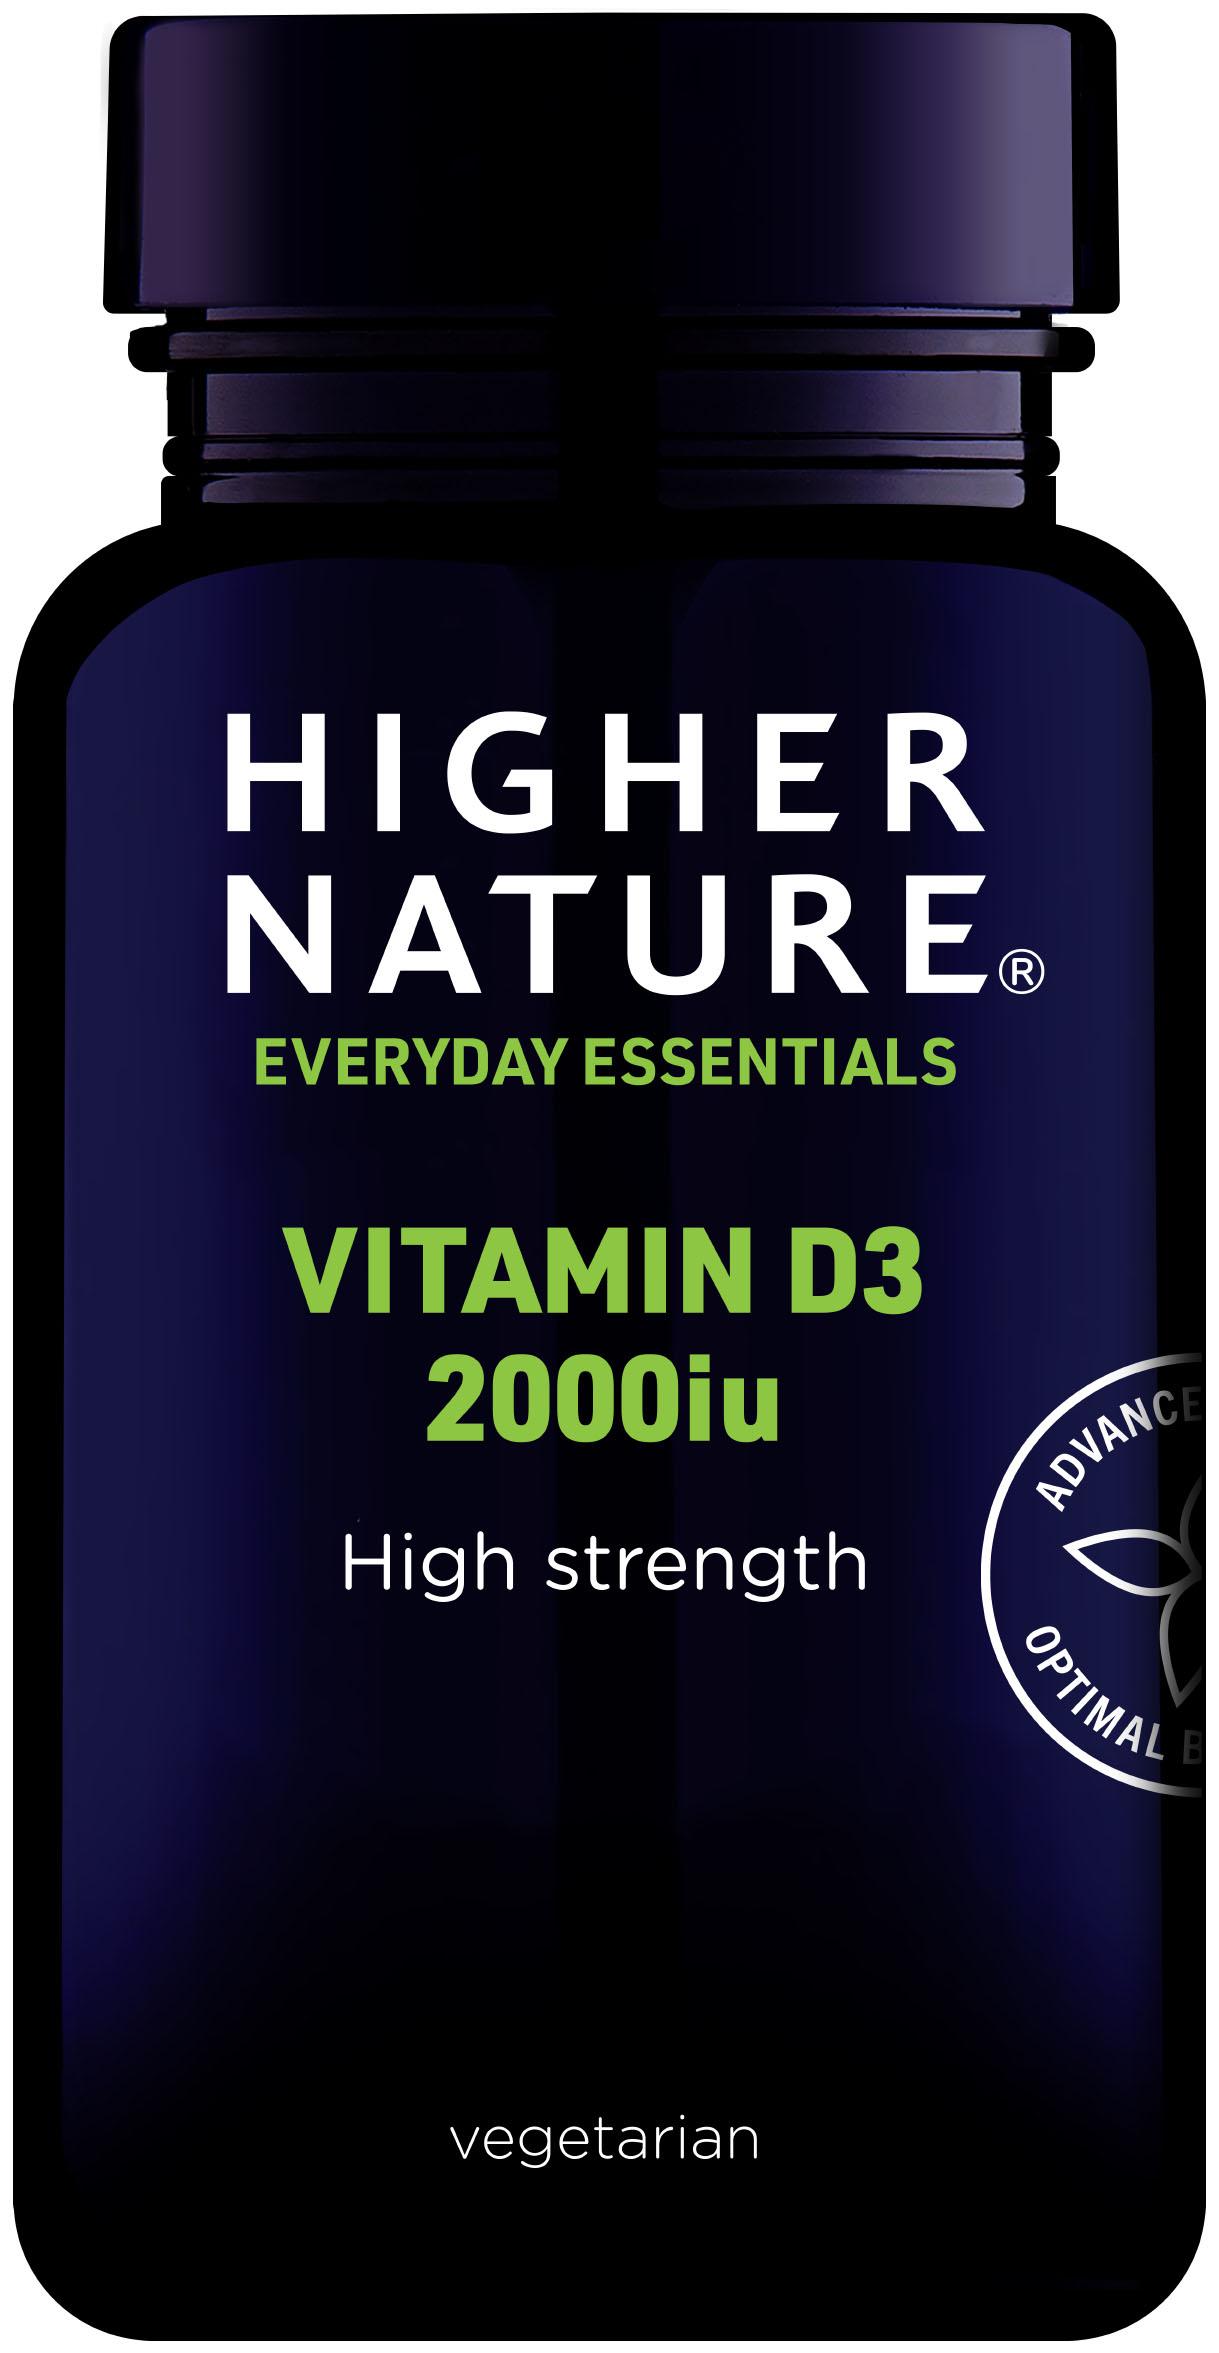 Vitamin D3 2000iu (High Strength) 120's